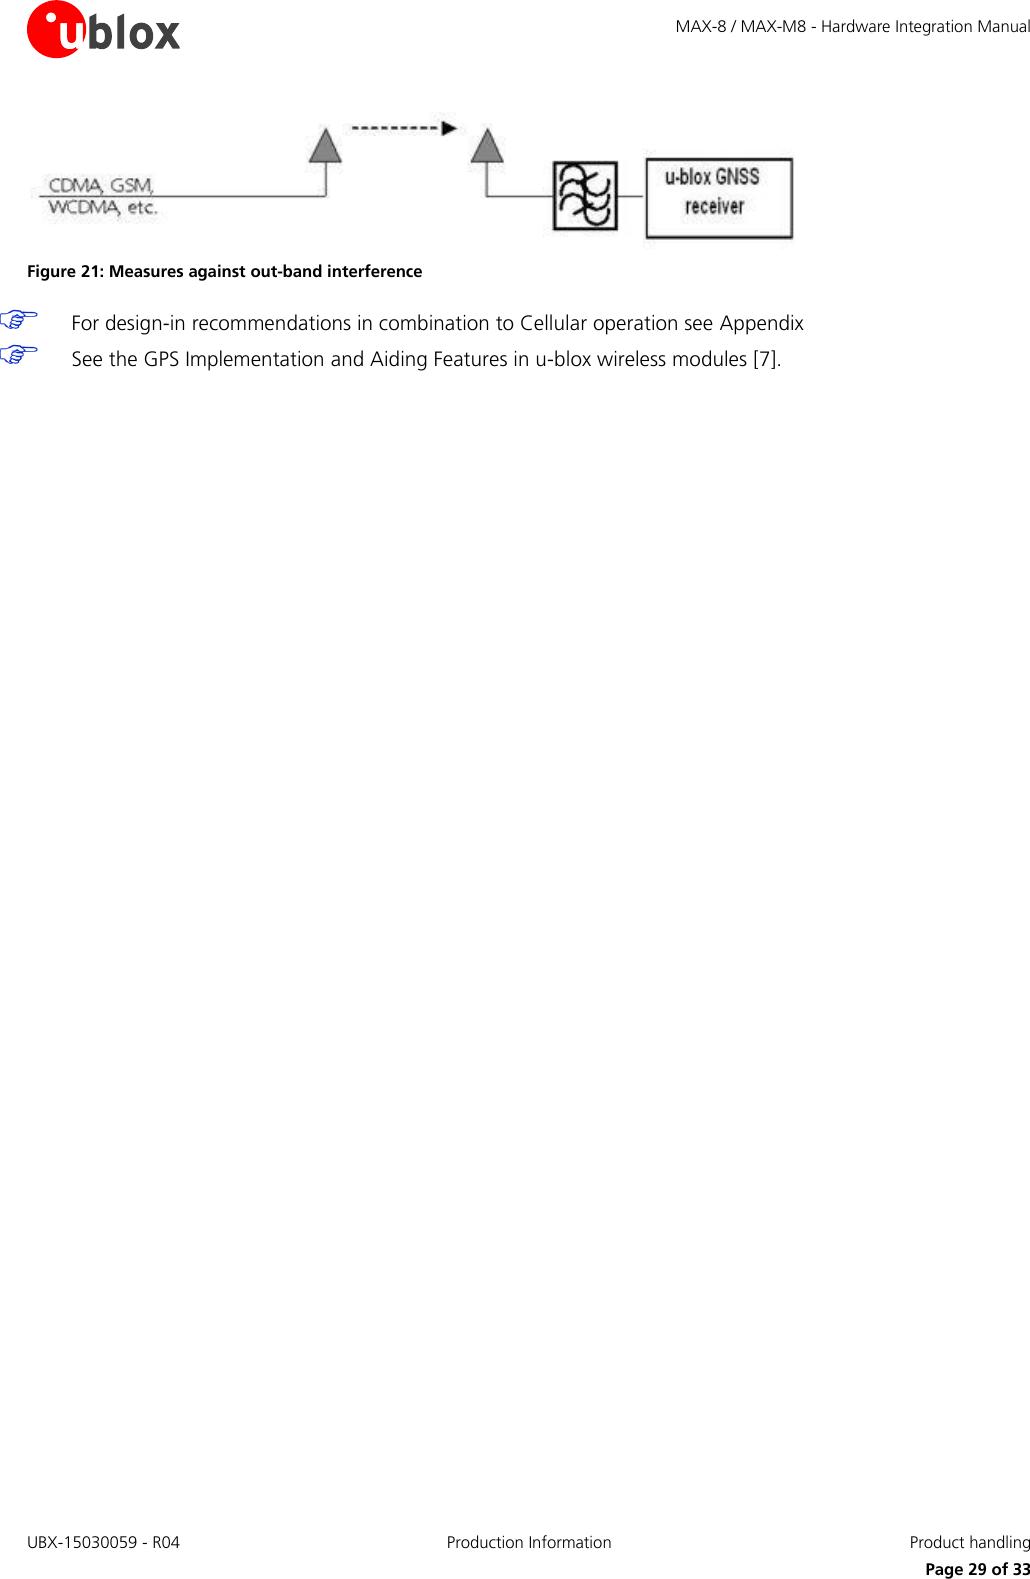 MAX 8 / M8 FW3 Hardware Integration Manual